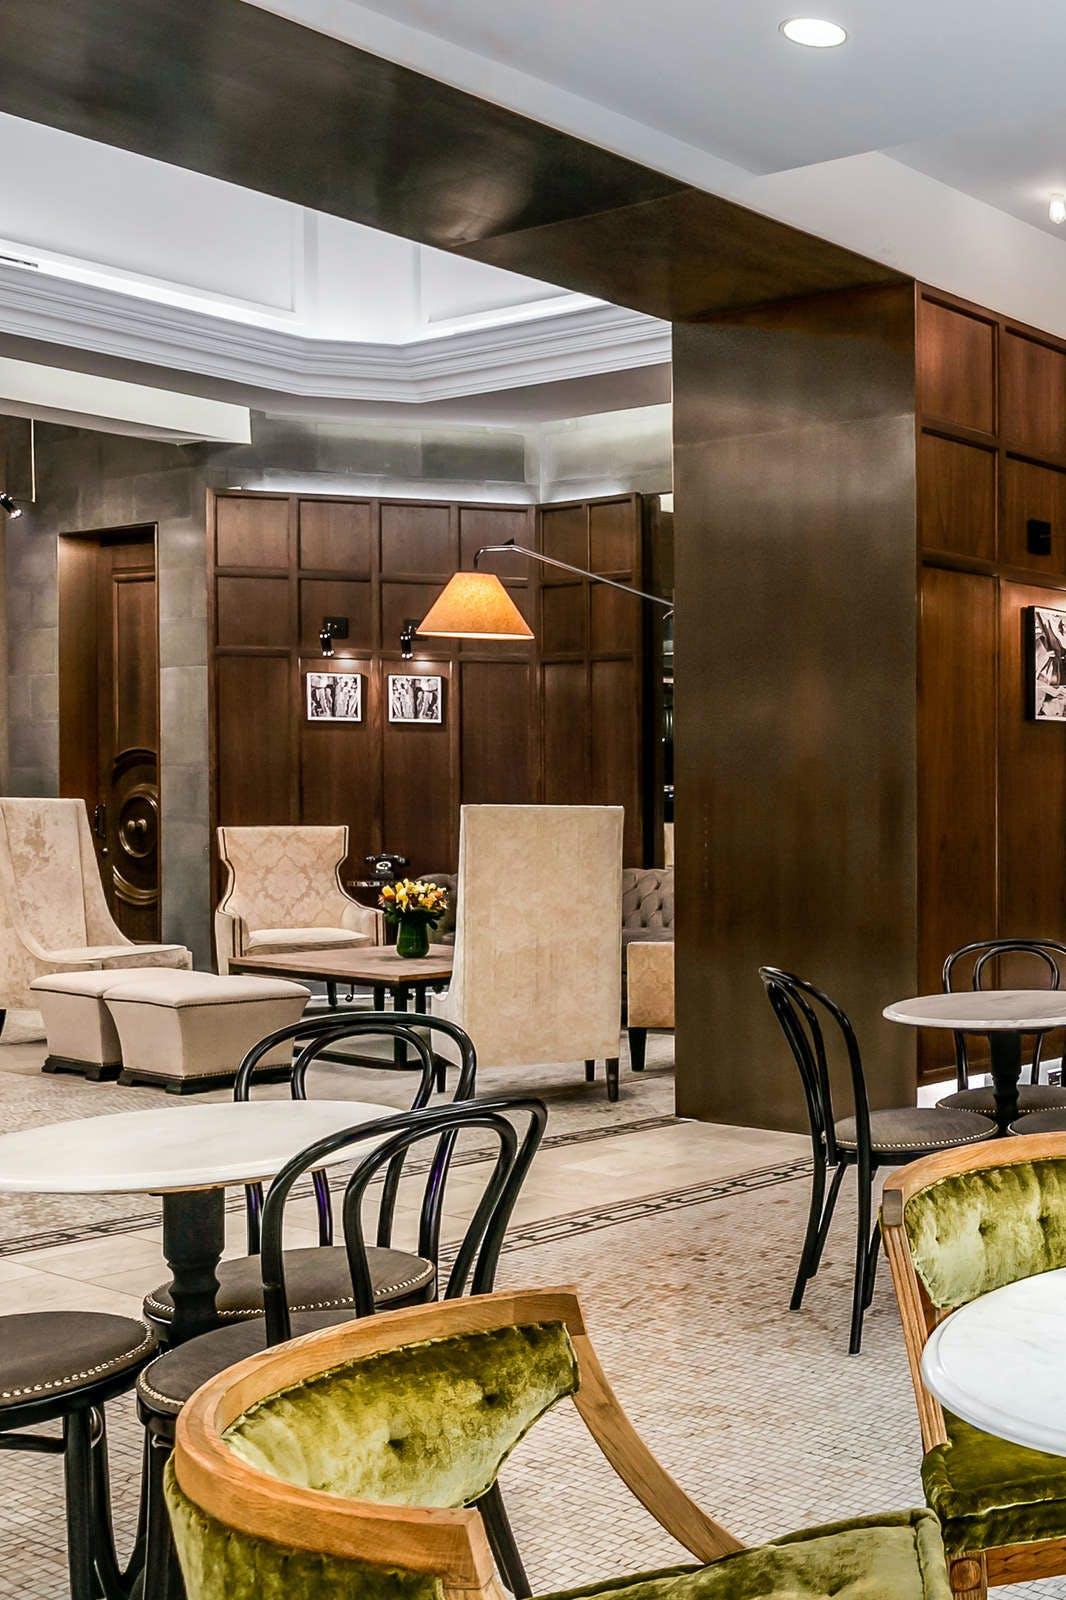 Hotel Belleclaire New York City Hoteltonight